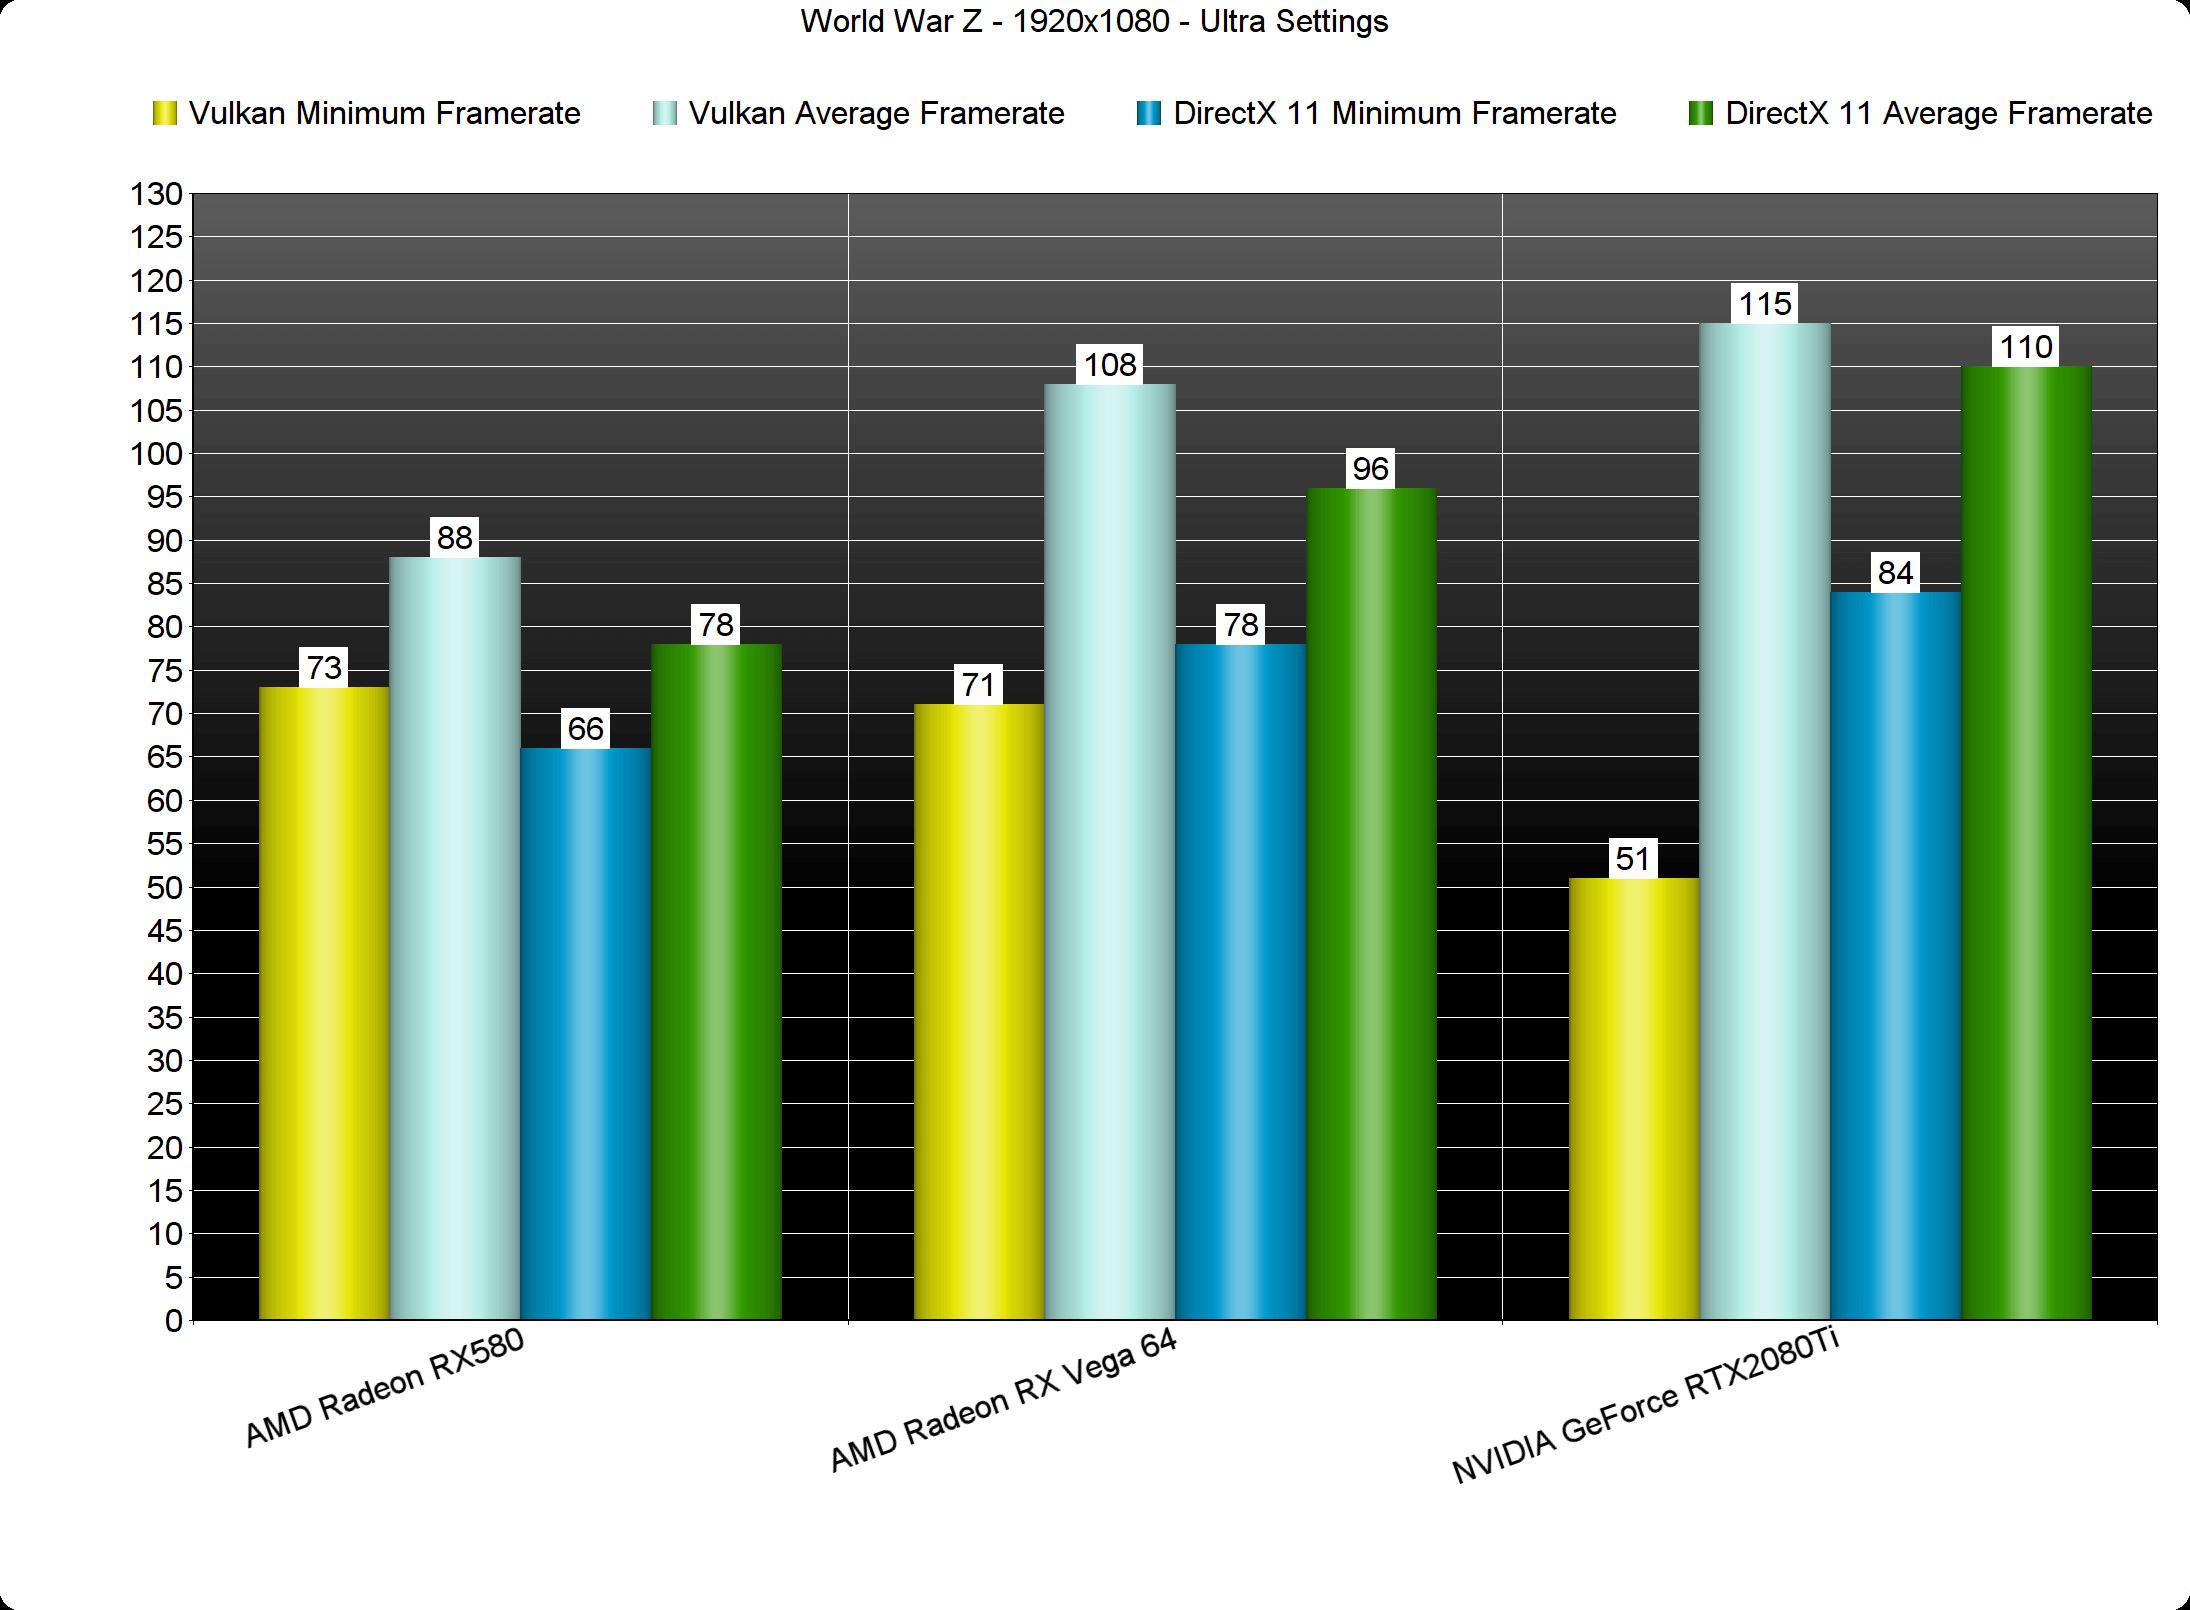 Vulkan versus DirectX 11 in World War Z - Higher framerates